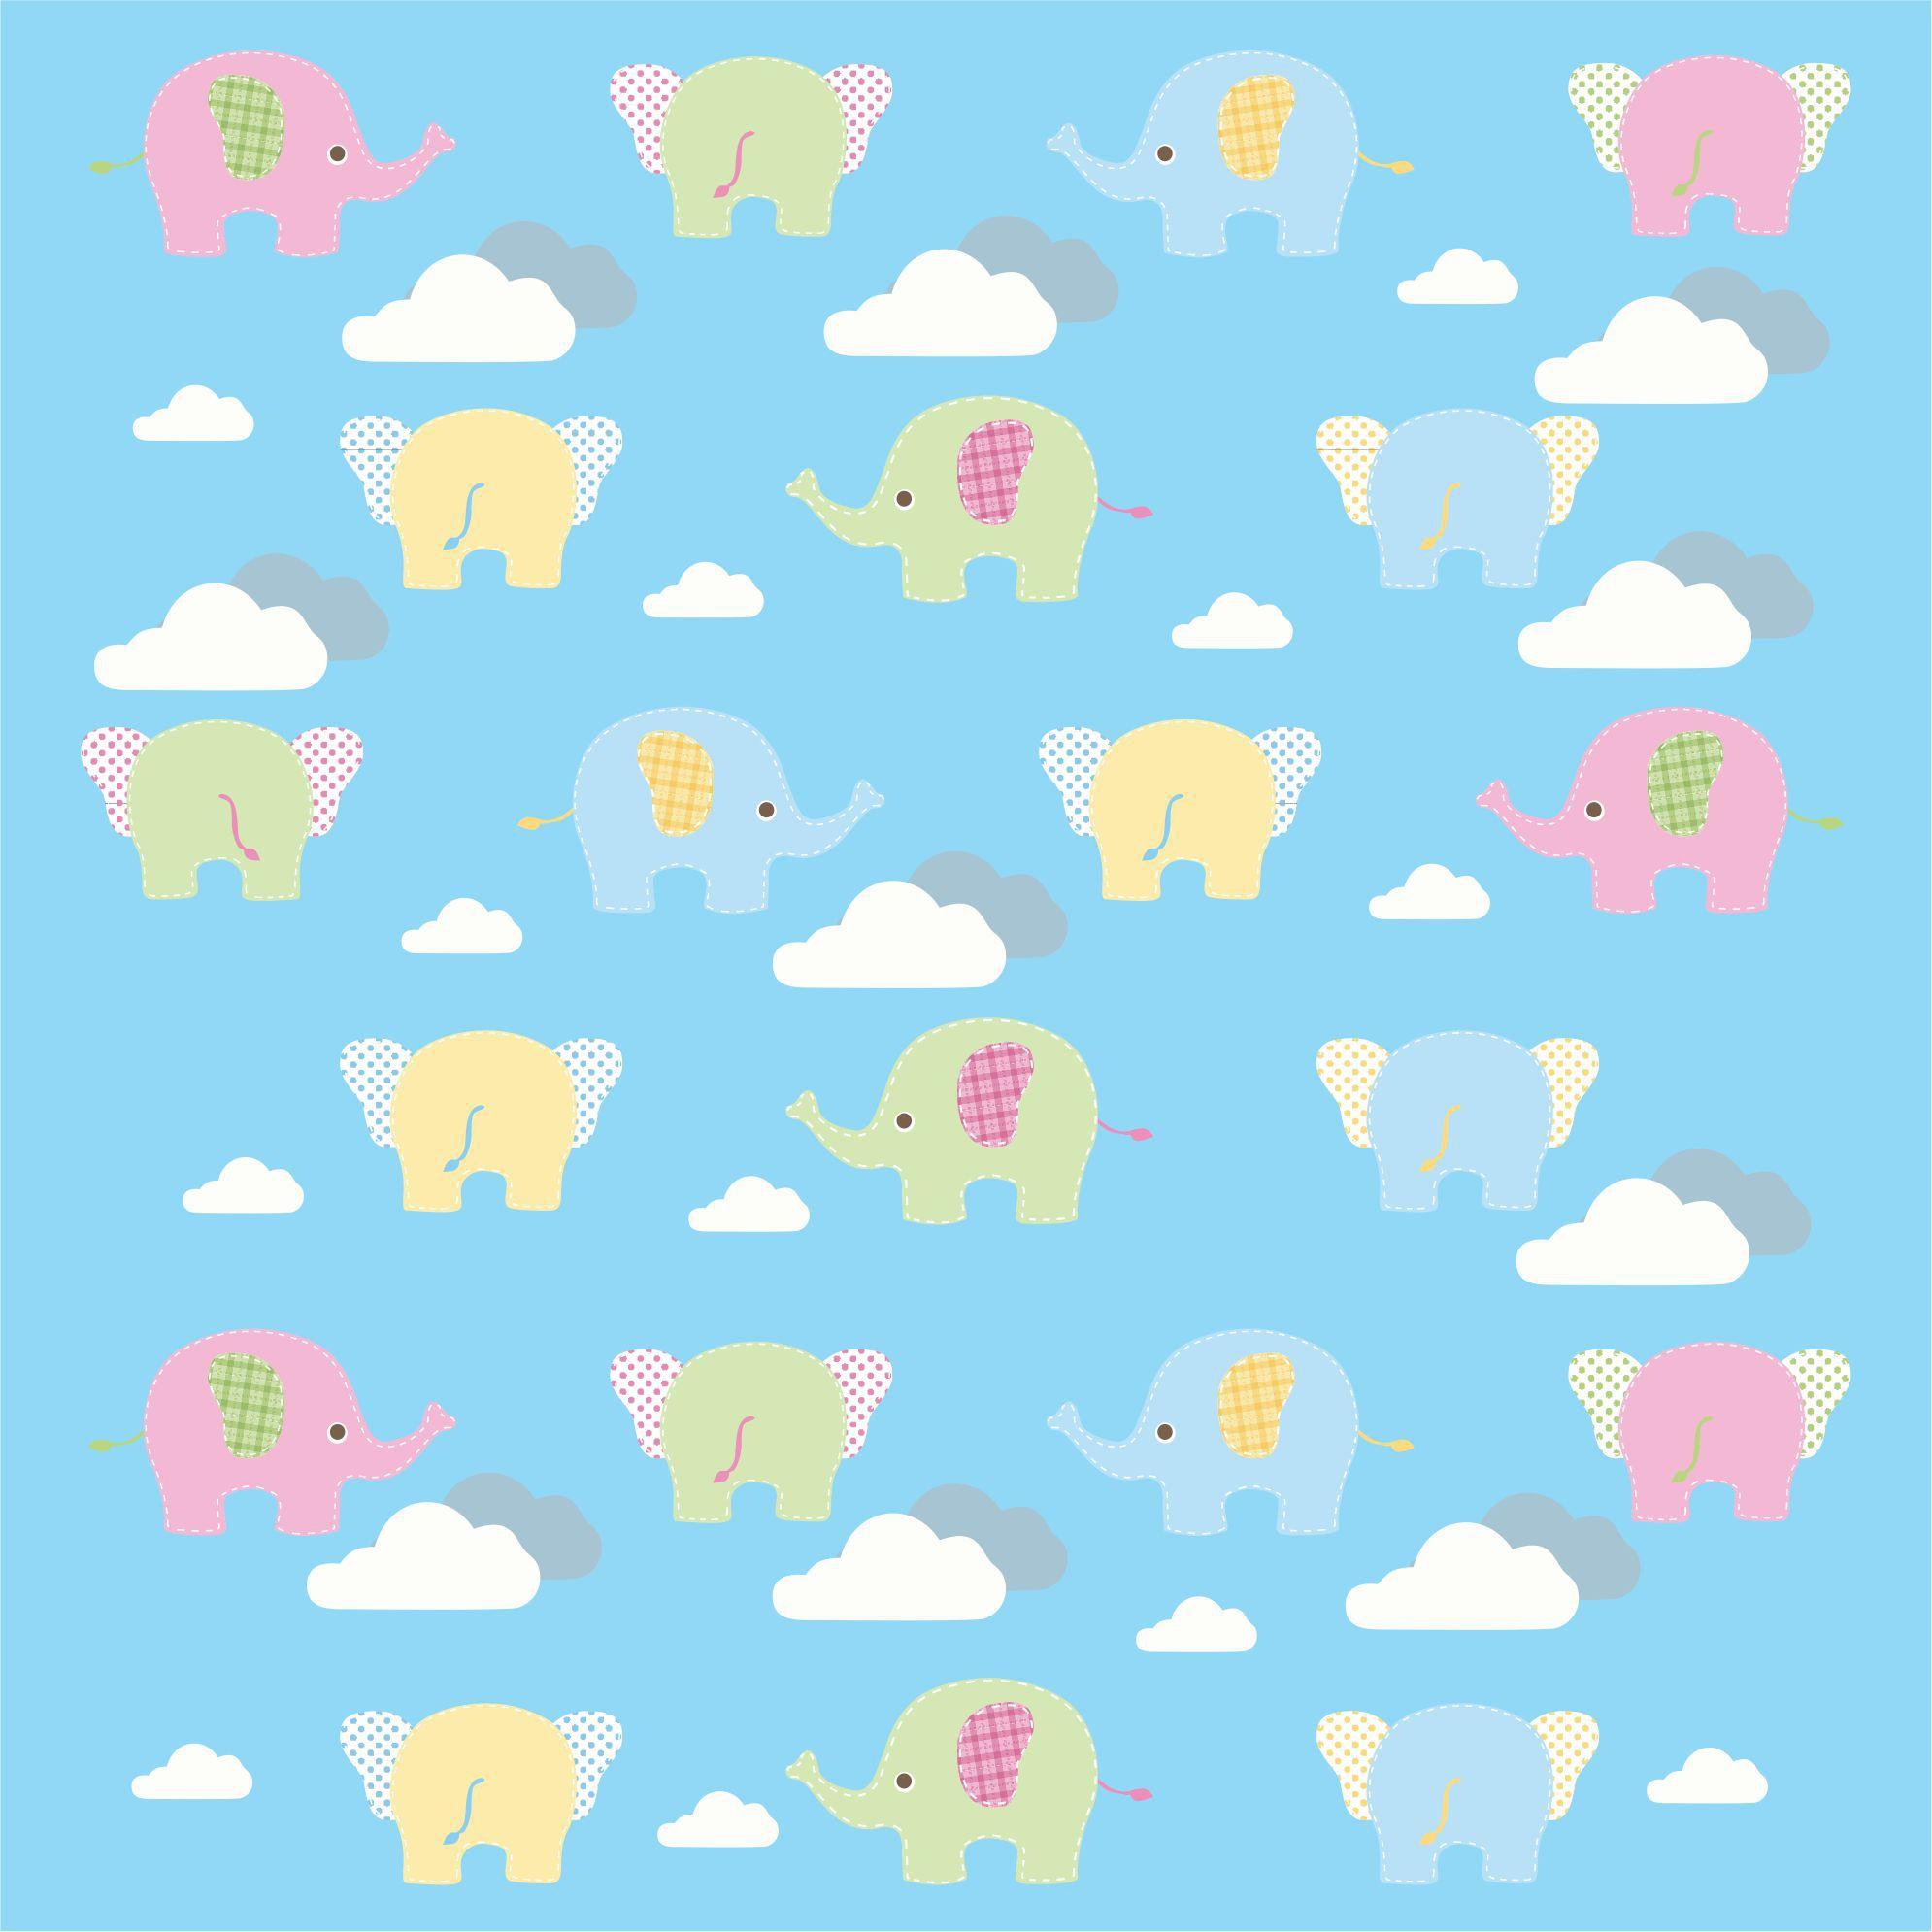 Papel Parede Elefante Rolo De 0,60 x 3,00